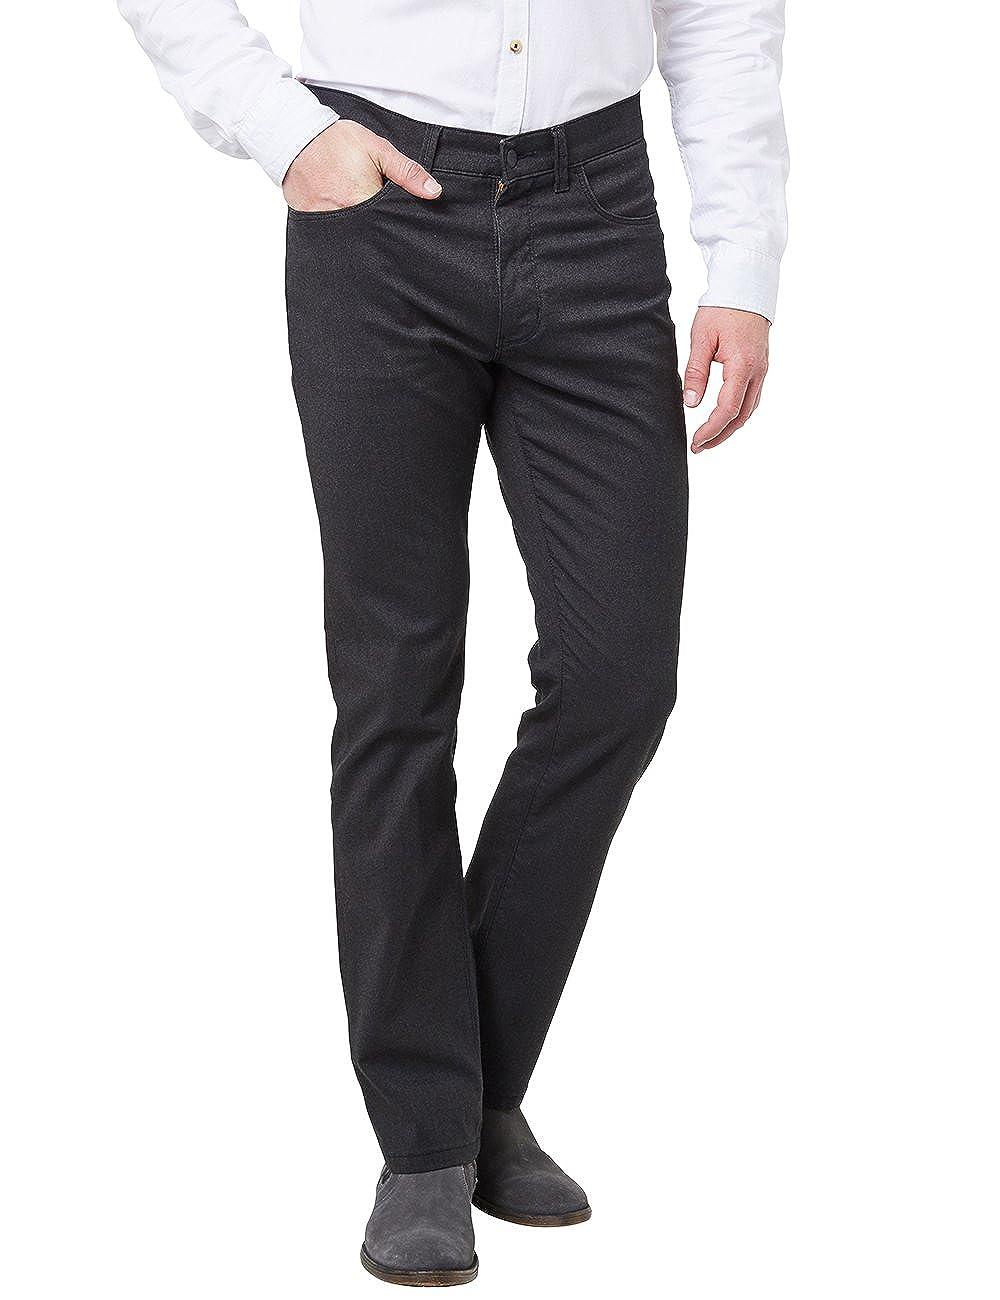 TALLA 30W / 30L. Pioneer Rando Tailor Made - Pantalones Hombre